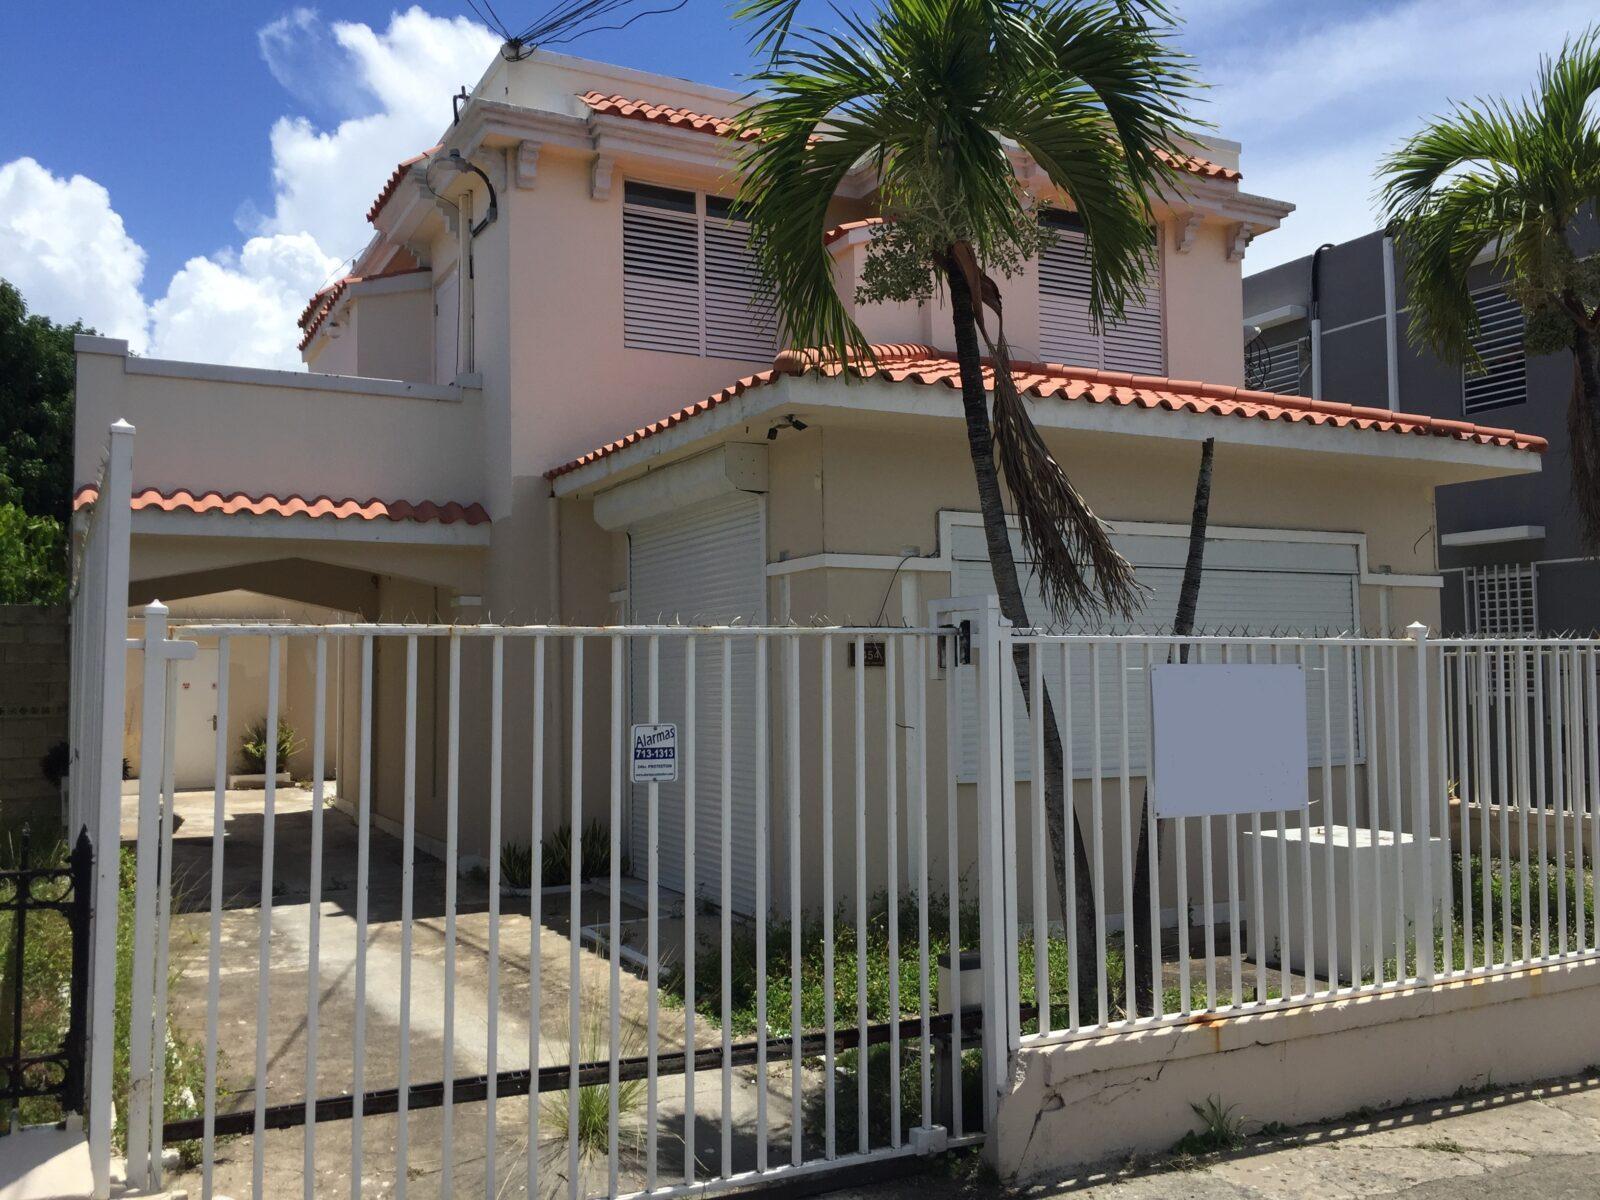 #1454 Ave. Fernandez Juncos San Juan, PR 00909